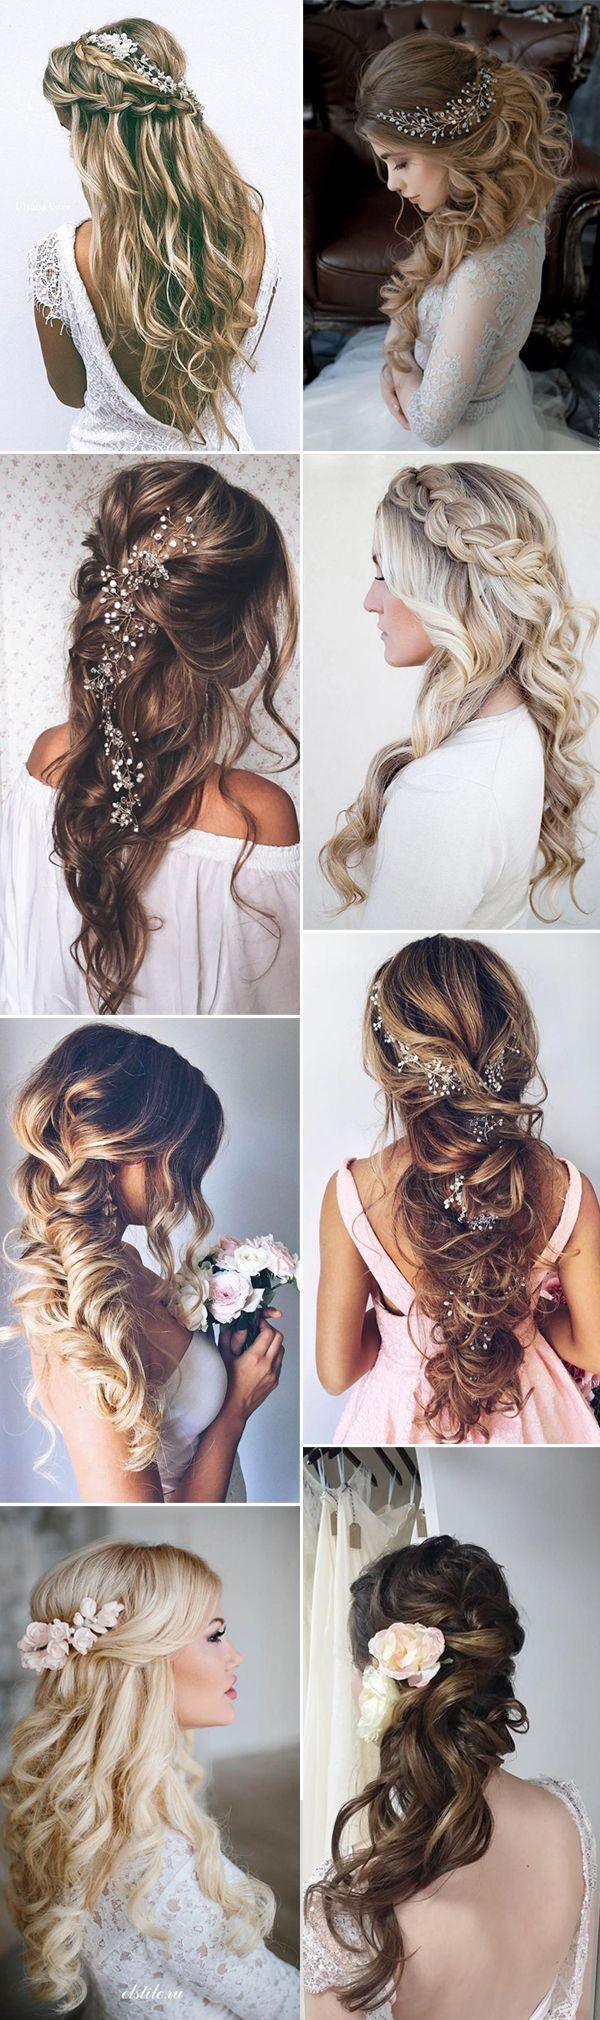 2017 wedding long hairstyles for brides https://www.daintyhooligan.com